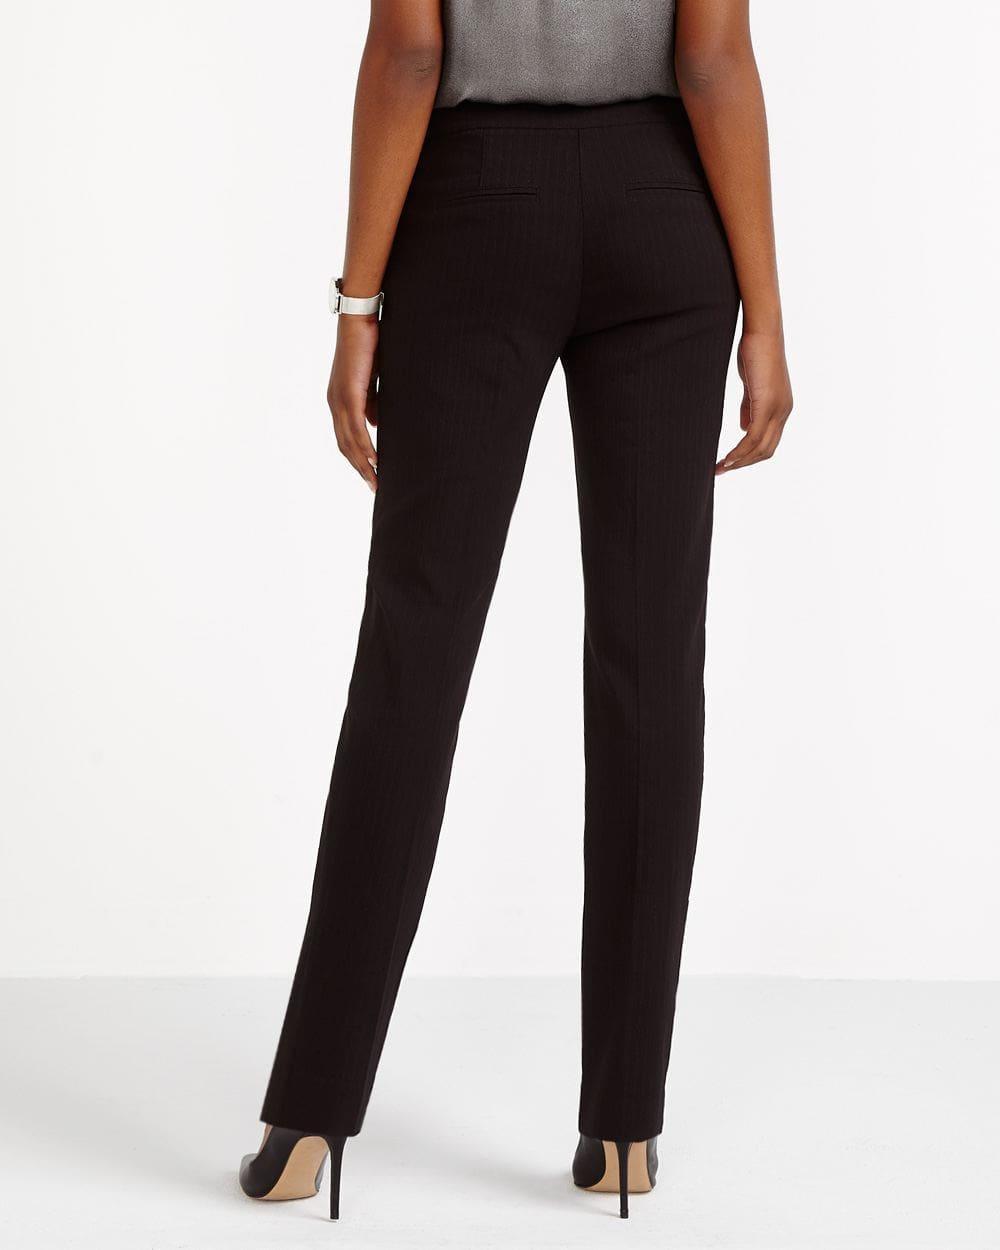 The Iconic Pattern Straight Leg Pants